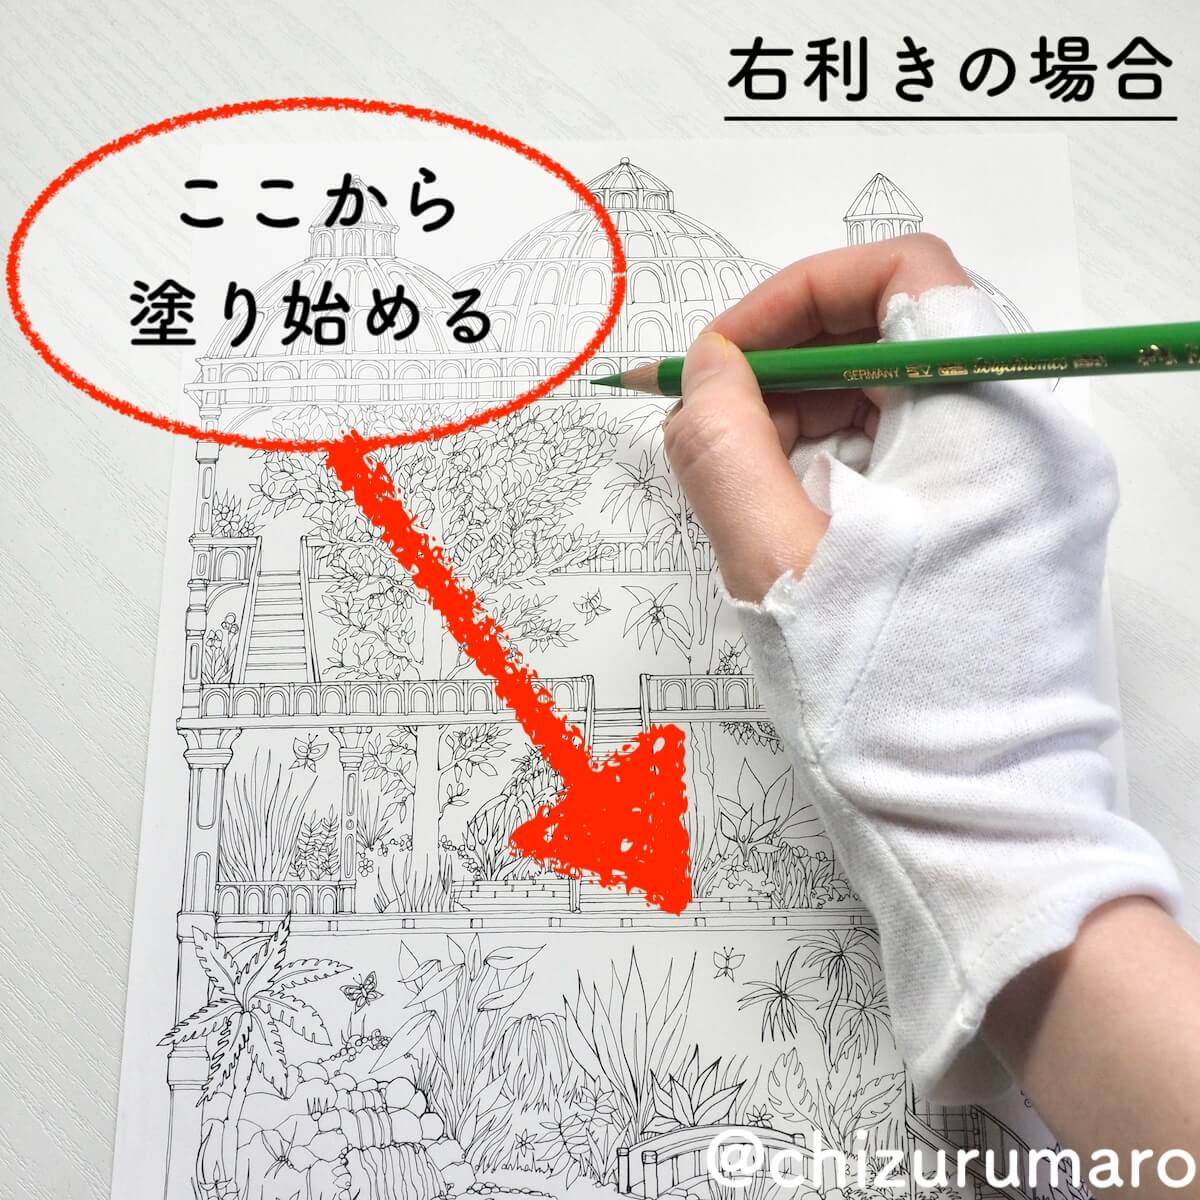 f:id:chizurumaro:20190703110319j:plain